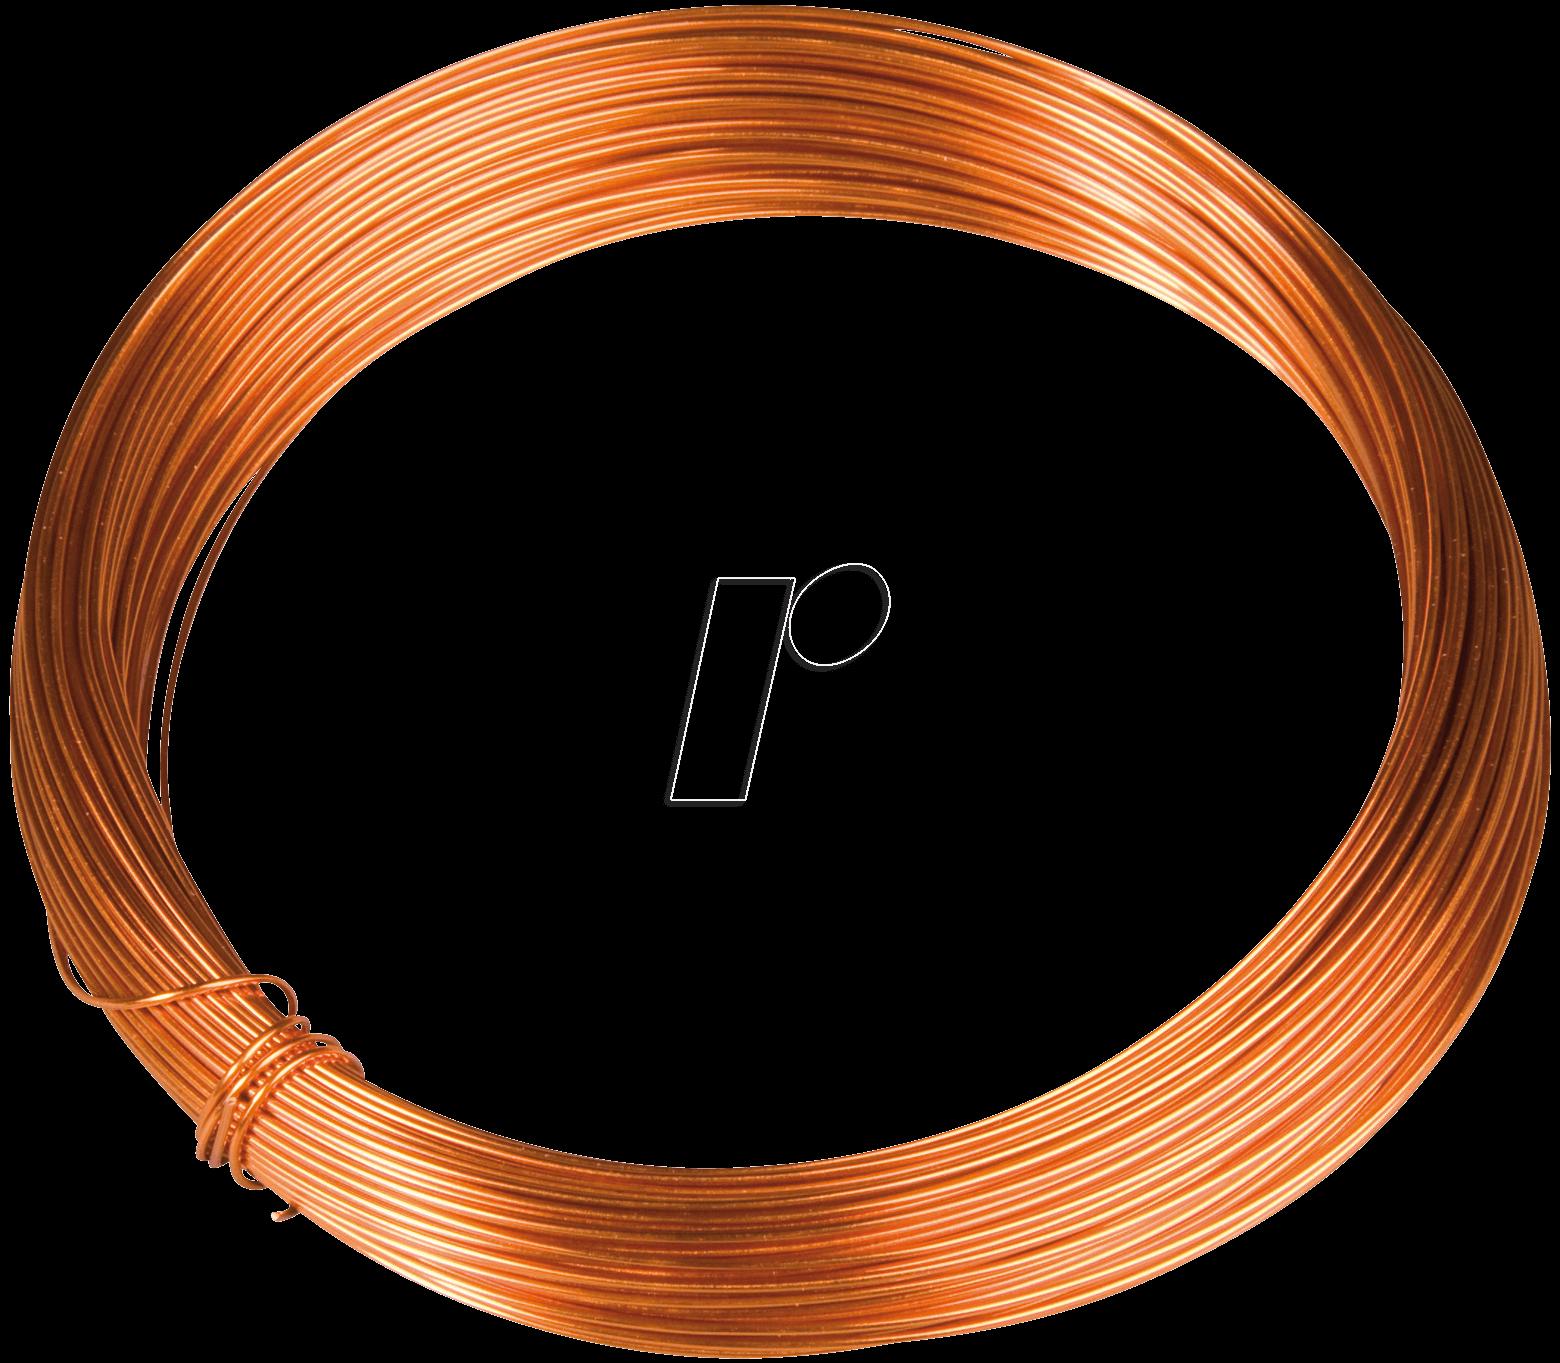 KUPFER 1,0MM: Enamelled copper wire, diameter 1.18 mm, length: 6 m ...